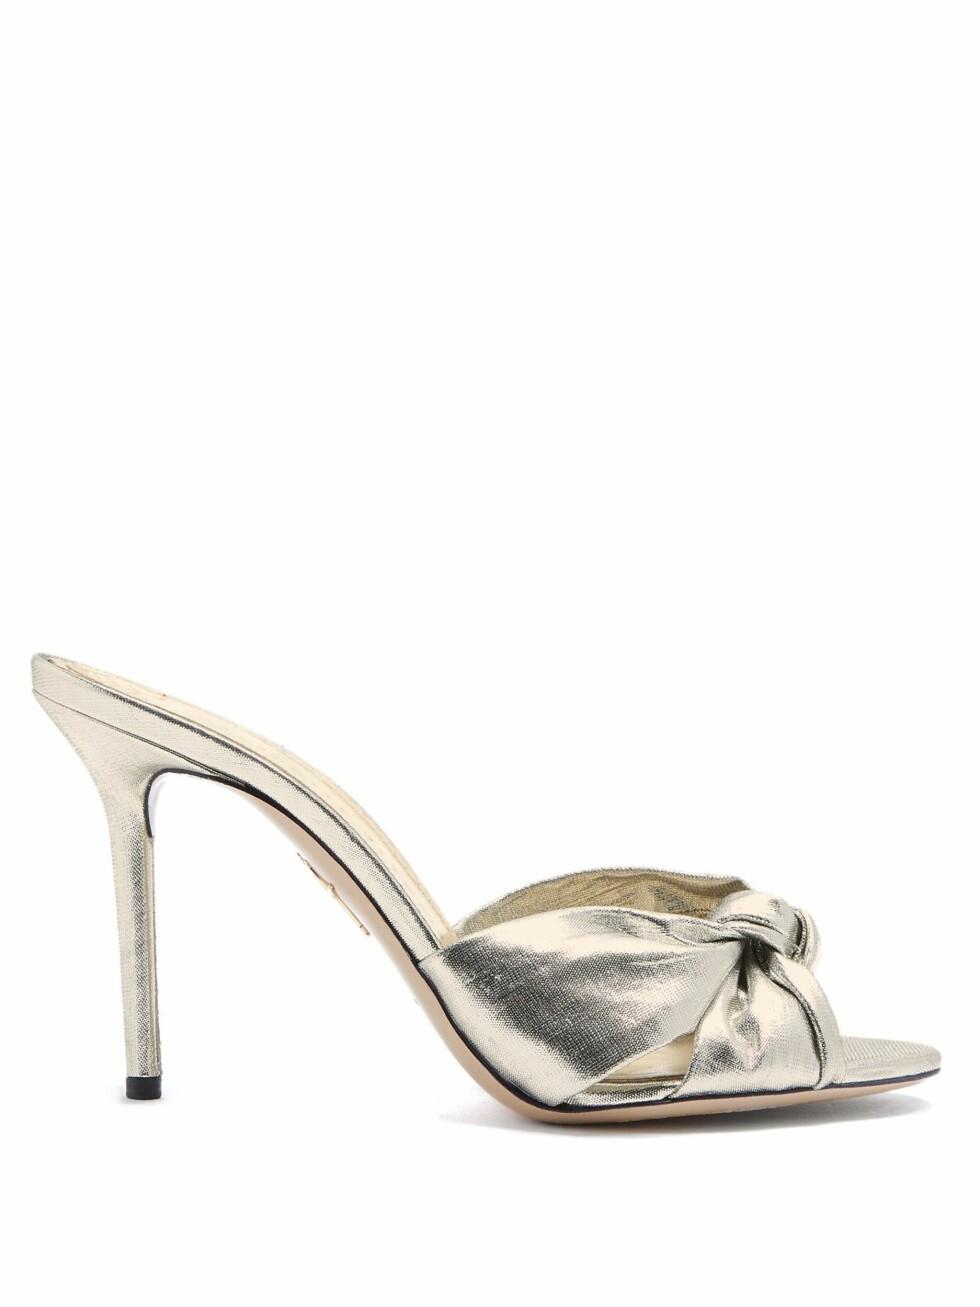 Sko fra Charlotte Olympia |2970,-| https://www.matchesfashion.com/intl/products/Charlotte-Olympia-Lola-twist-strap-lam%C3%A9-sandals--1185898